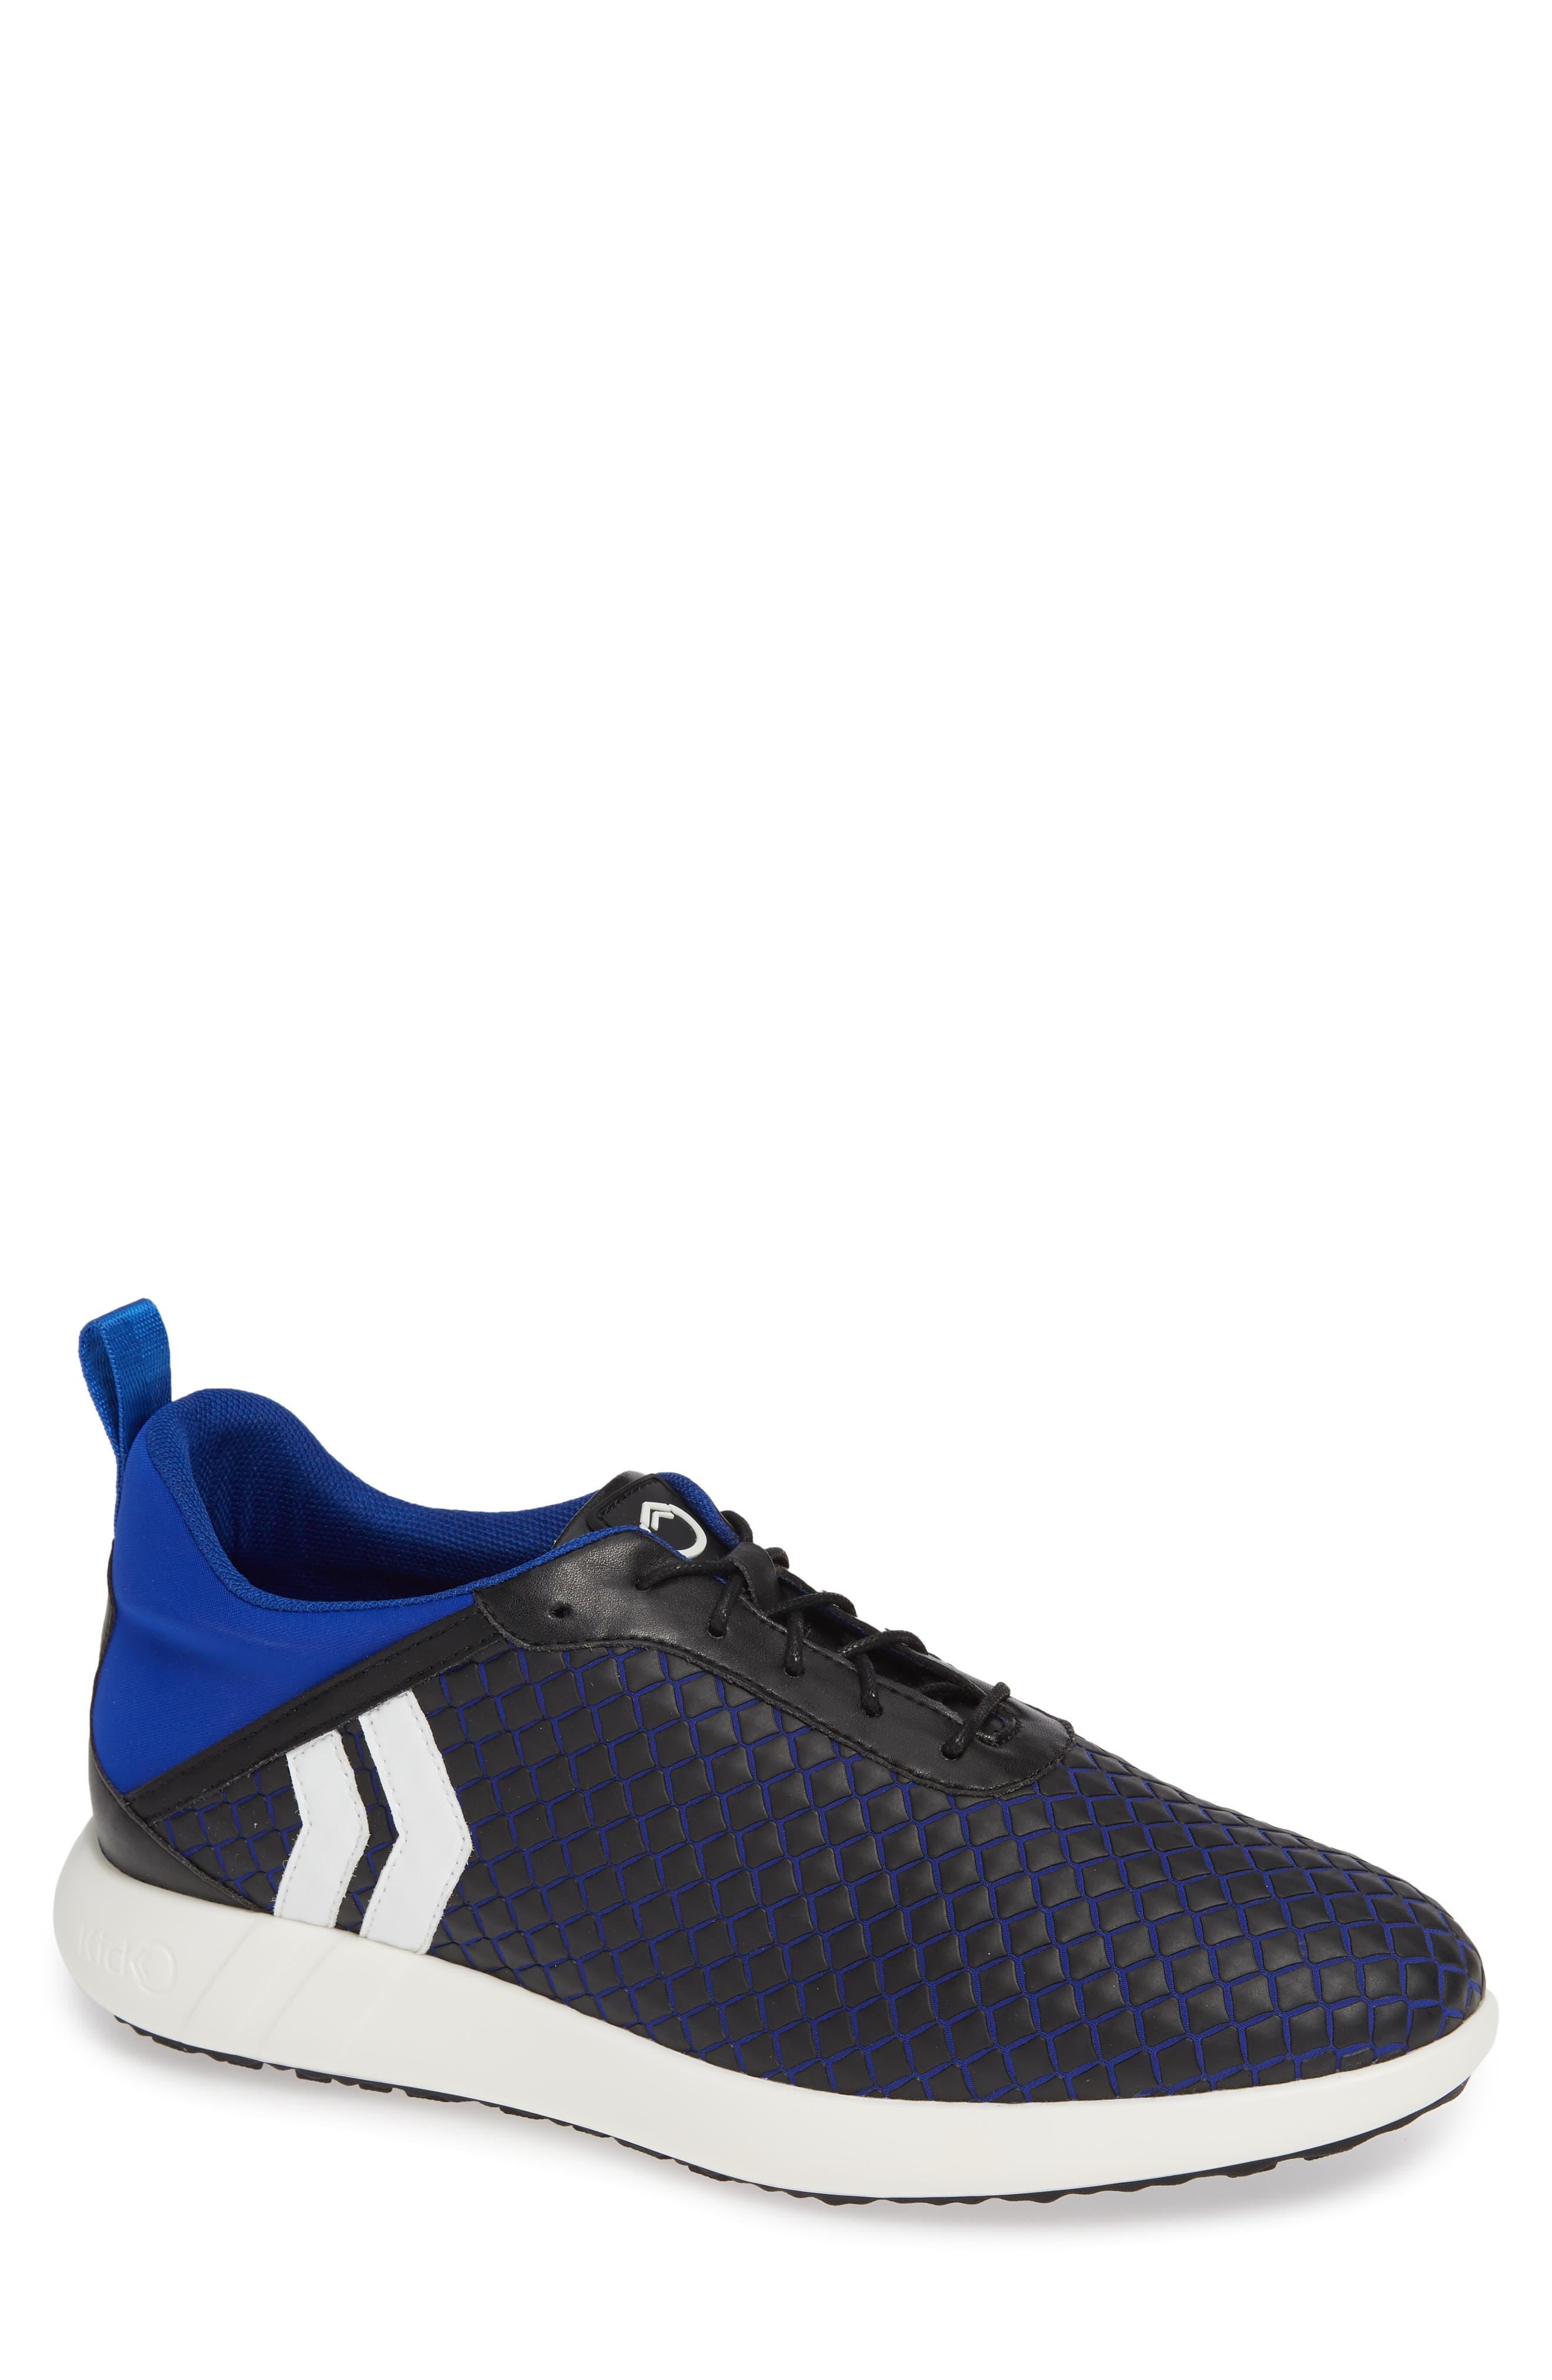 Onyx Sneaker,                         Main,                         color, 430